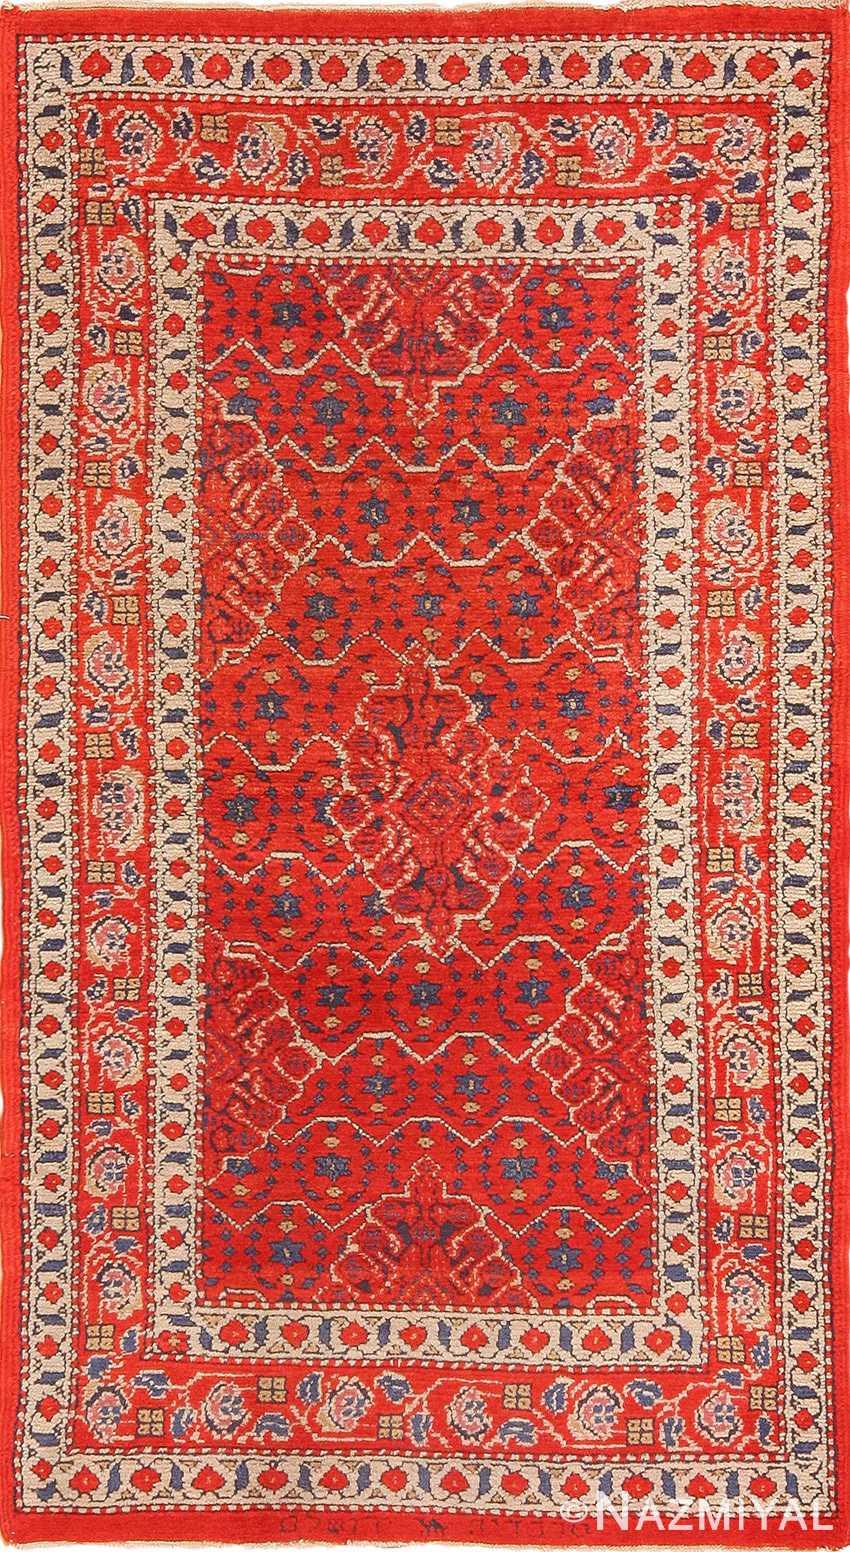 Small Size Antique Israeli Marbediah Rug 49736 - Nazmiyal